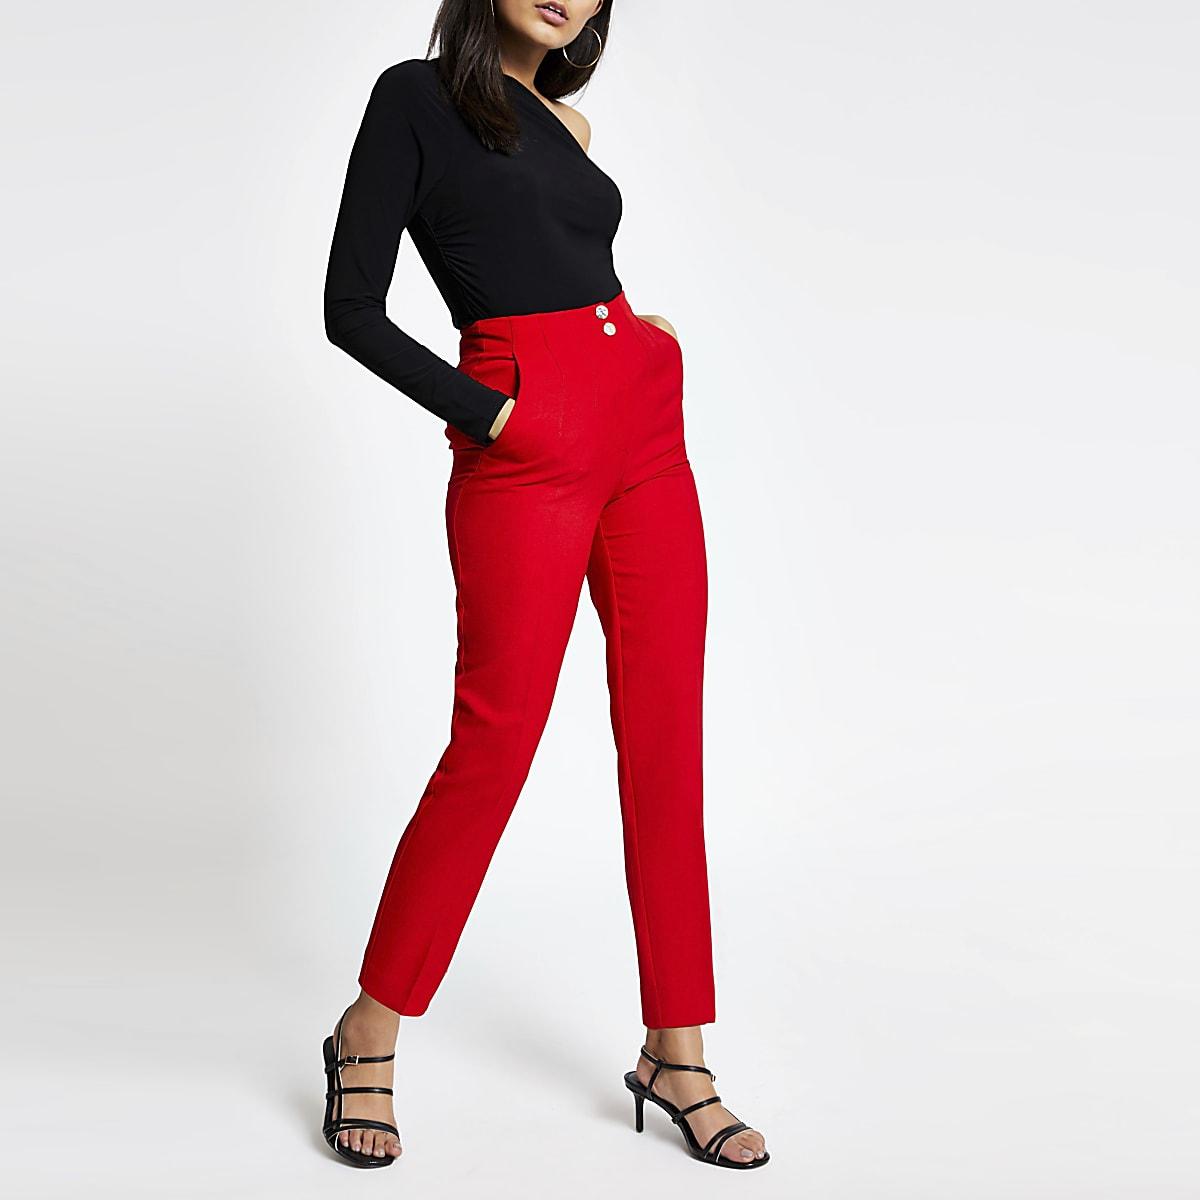 Red Cigarette Waist High Trousers ulFTK1cJ3